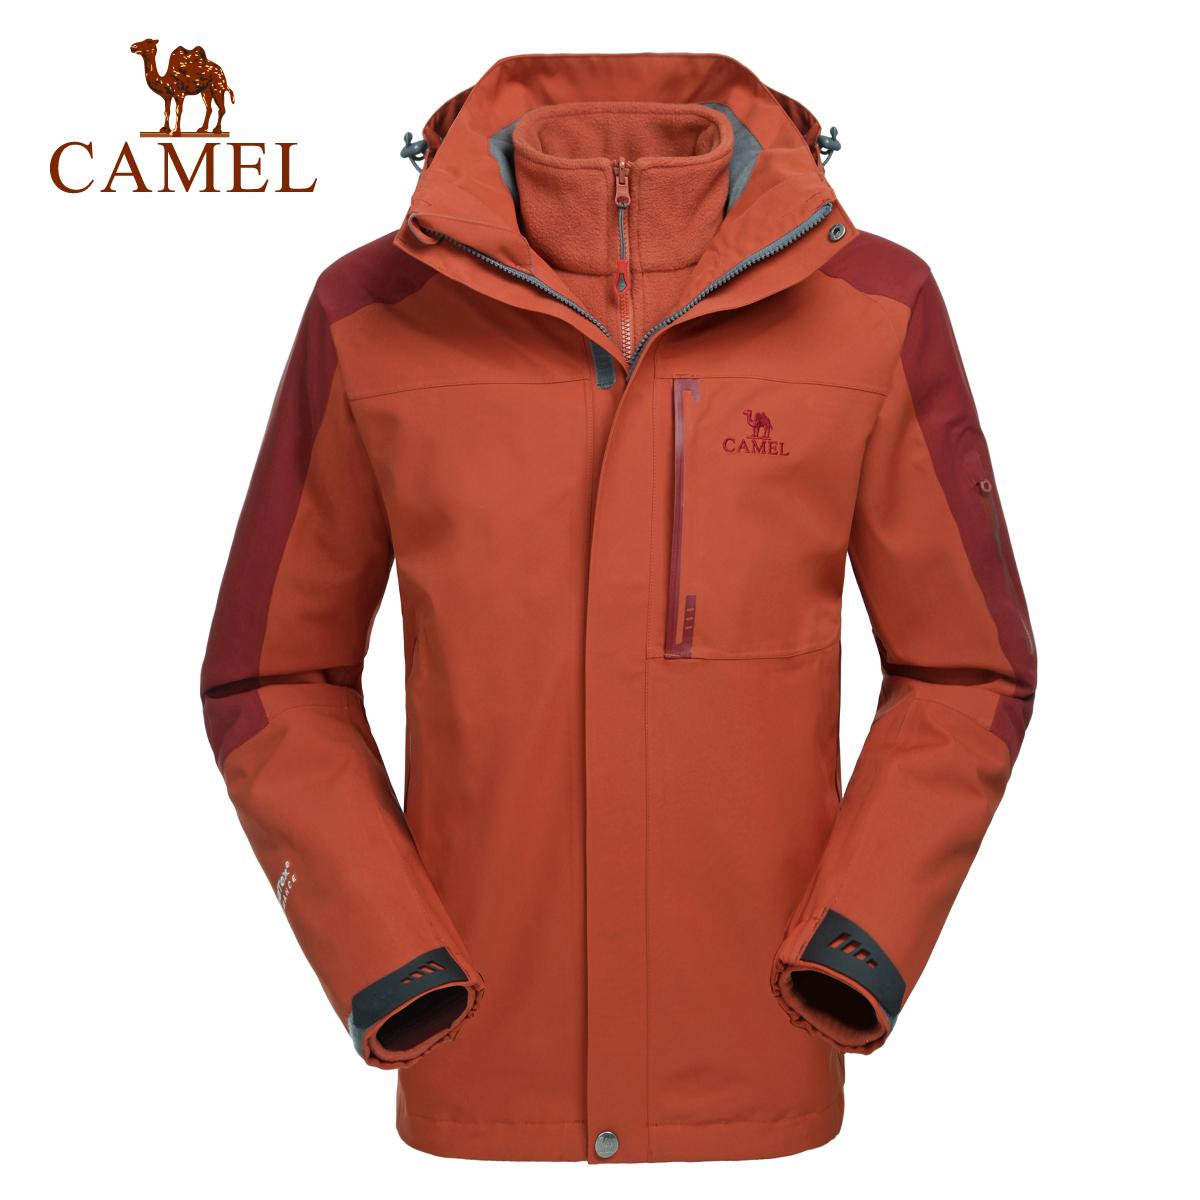 camel骆驼户外冲锋衣 冬季男款防水透气保暖三合一冲锋衣